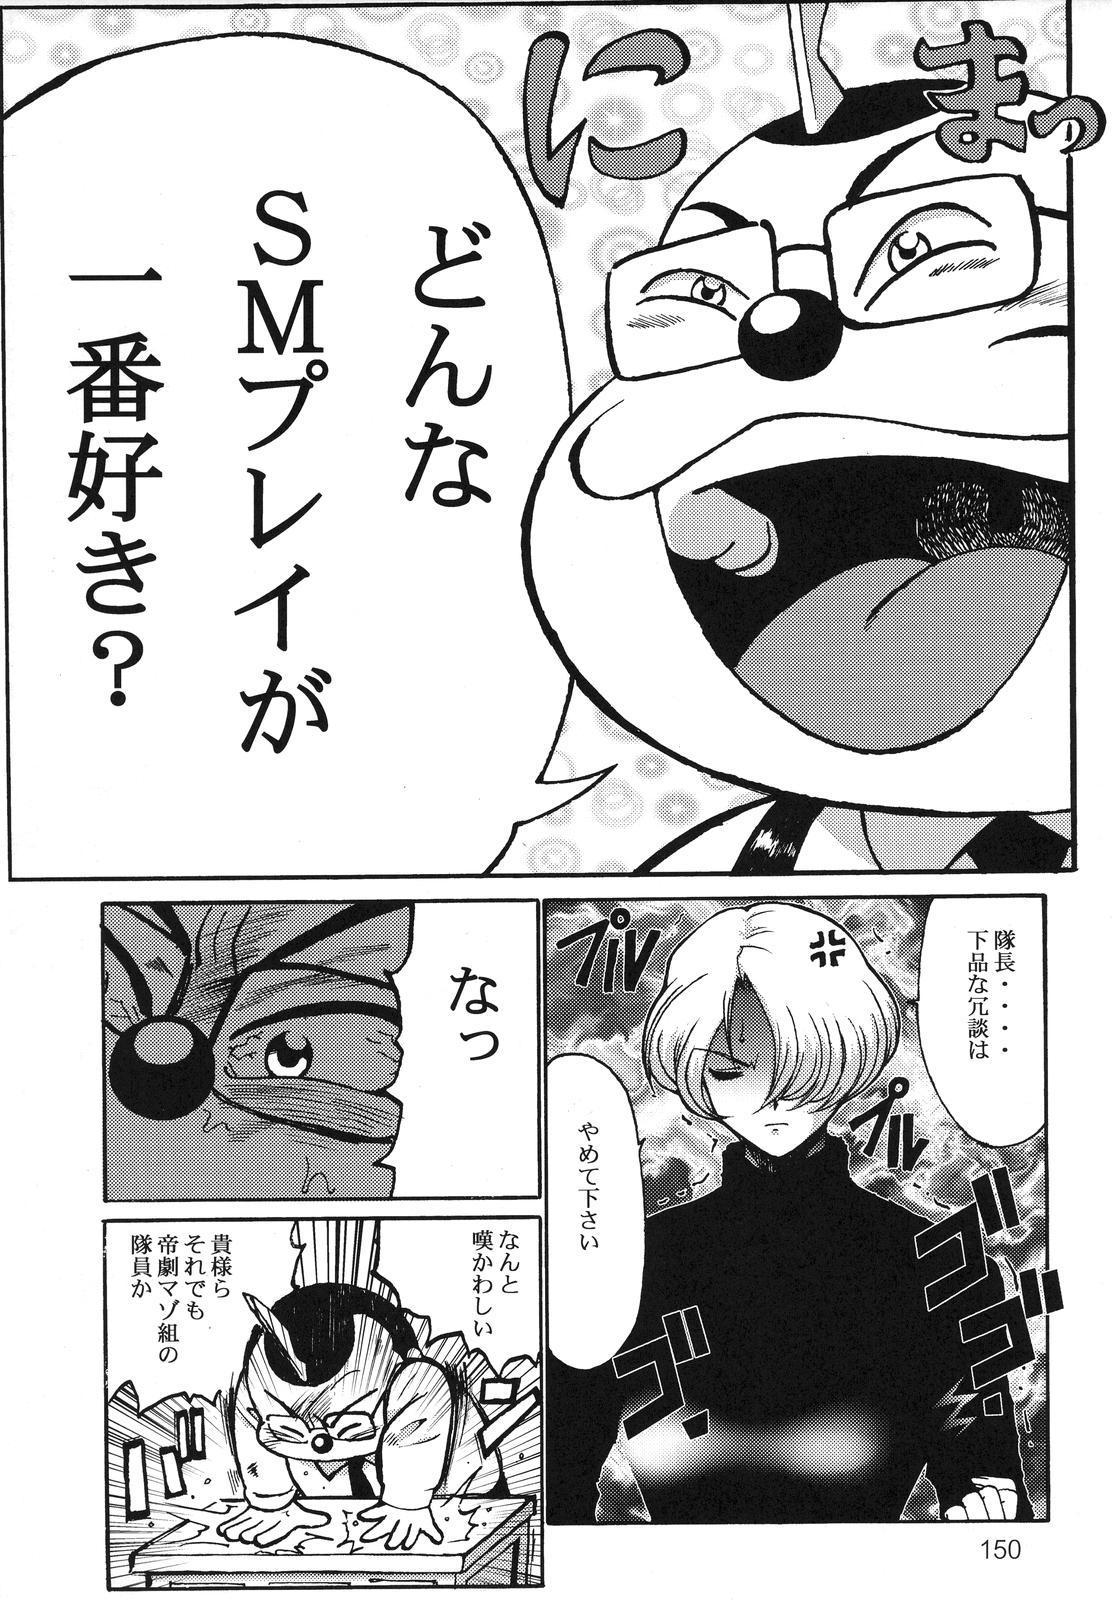 Kikan Yumi Ichirou vol.1~3 Soushuuhen + Alpha 148